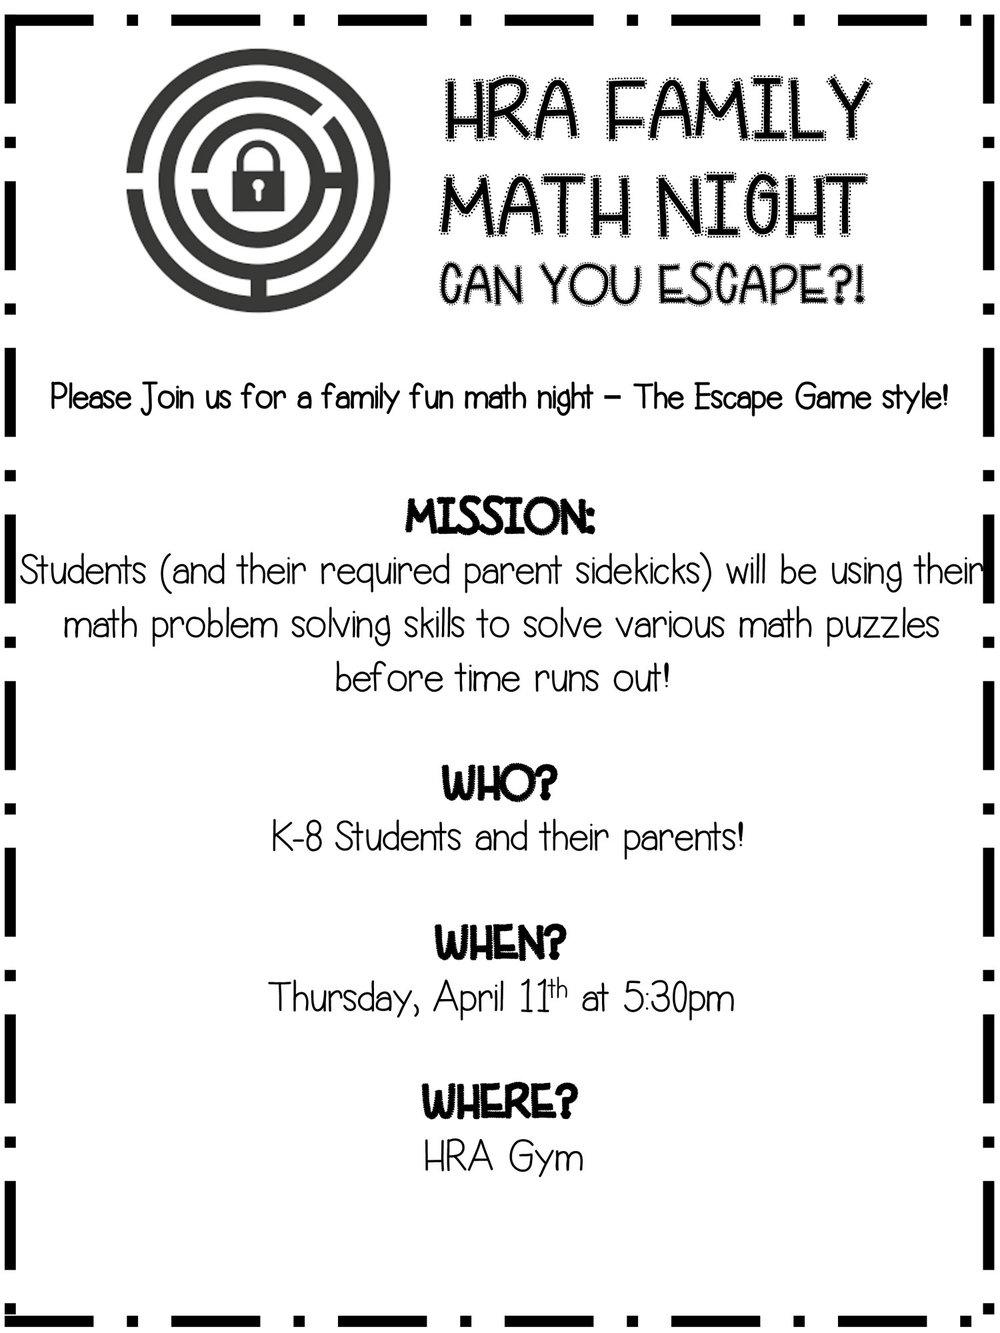 HRA-Family-Math-Night-Flyer.jpg